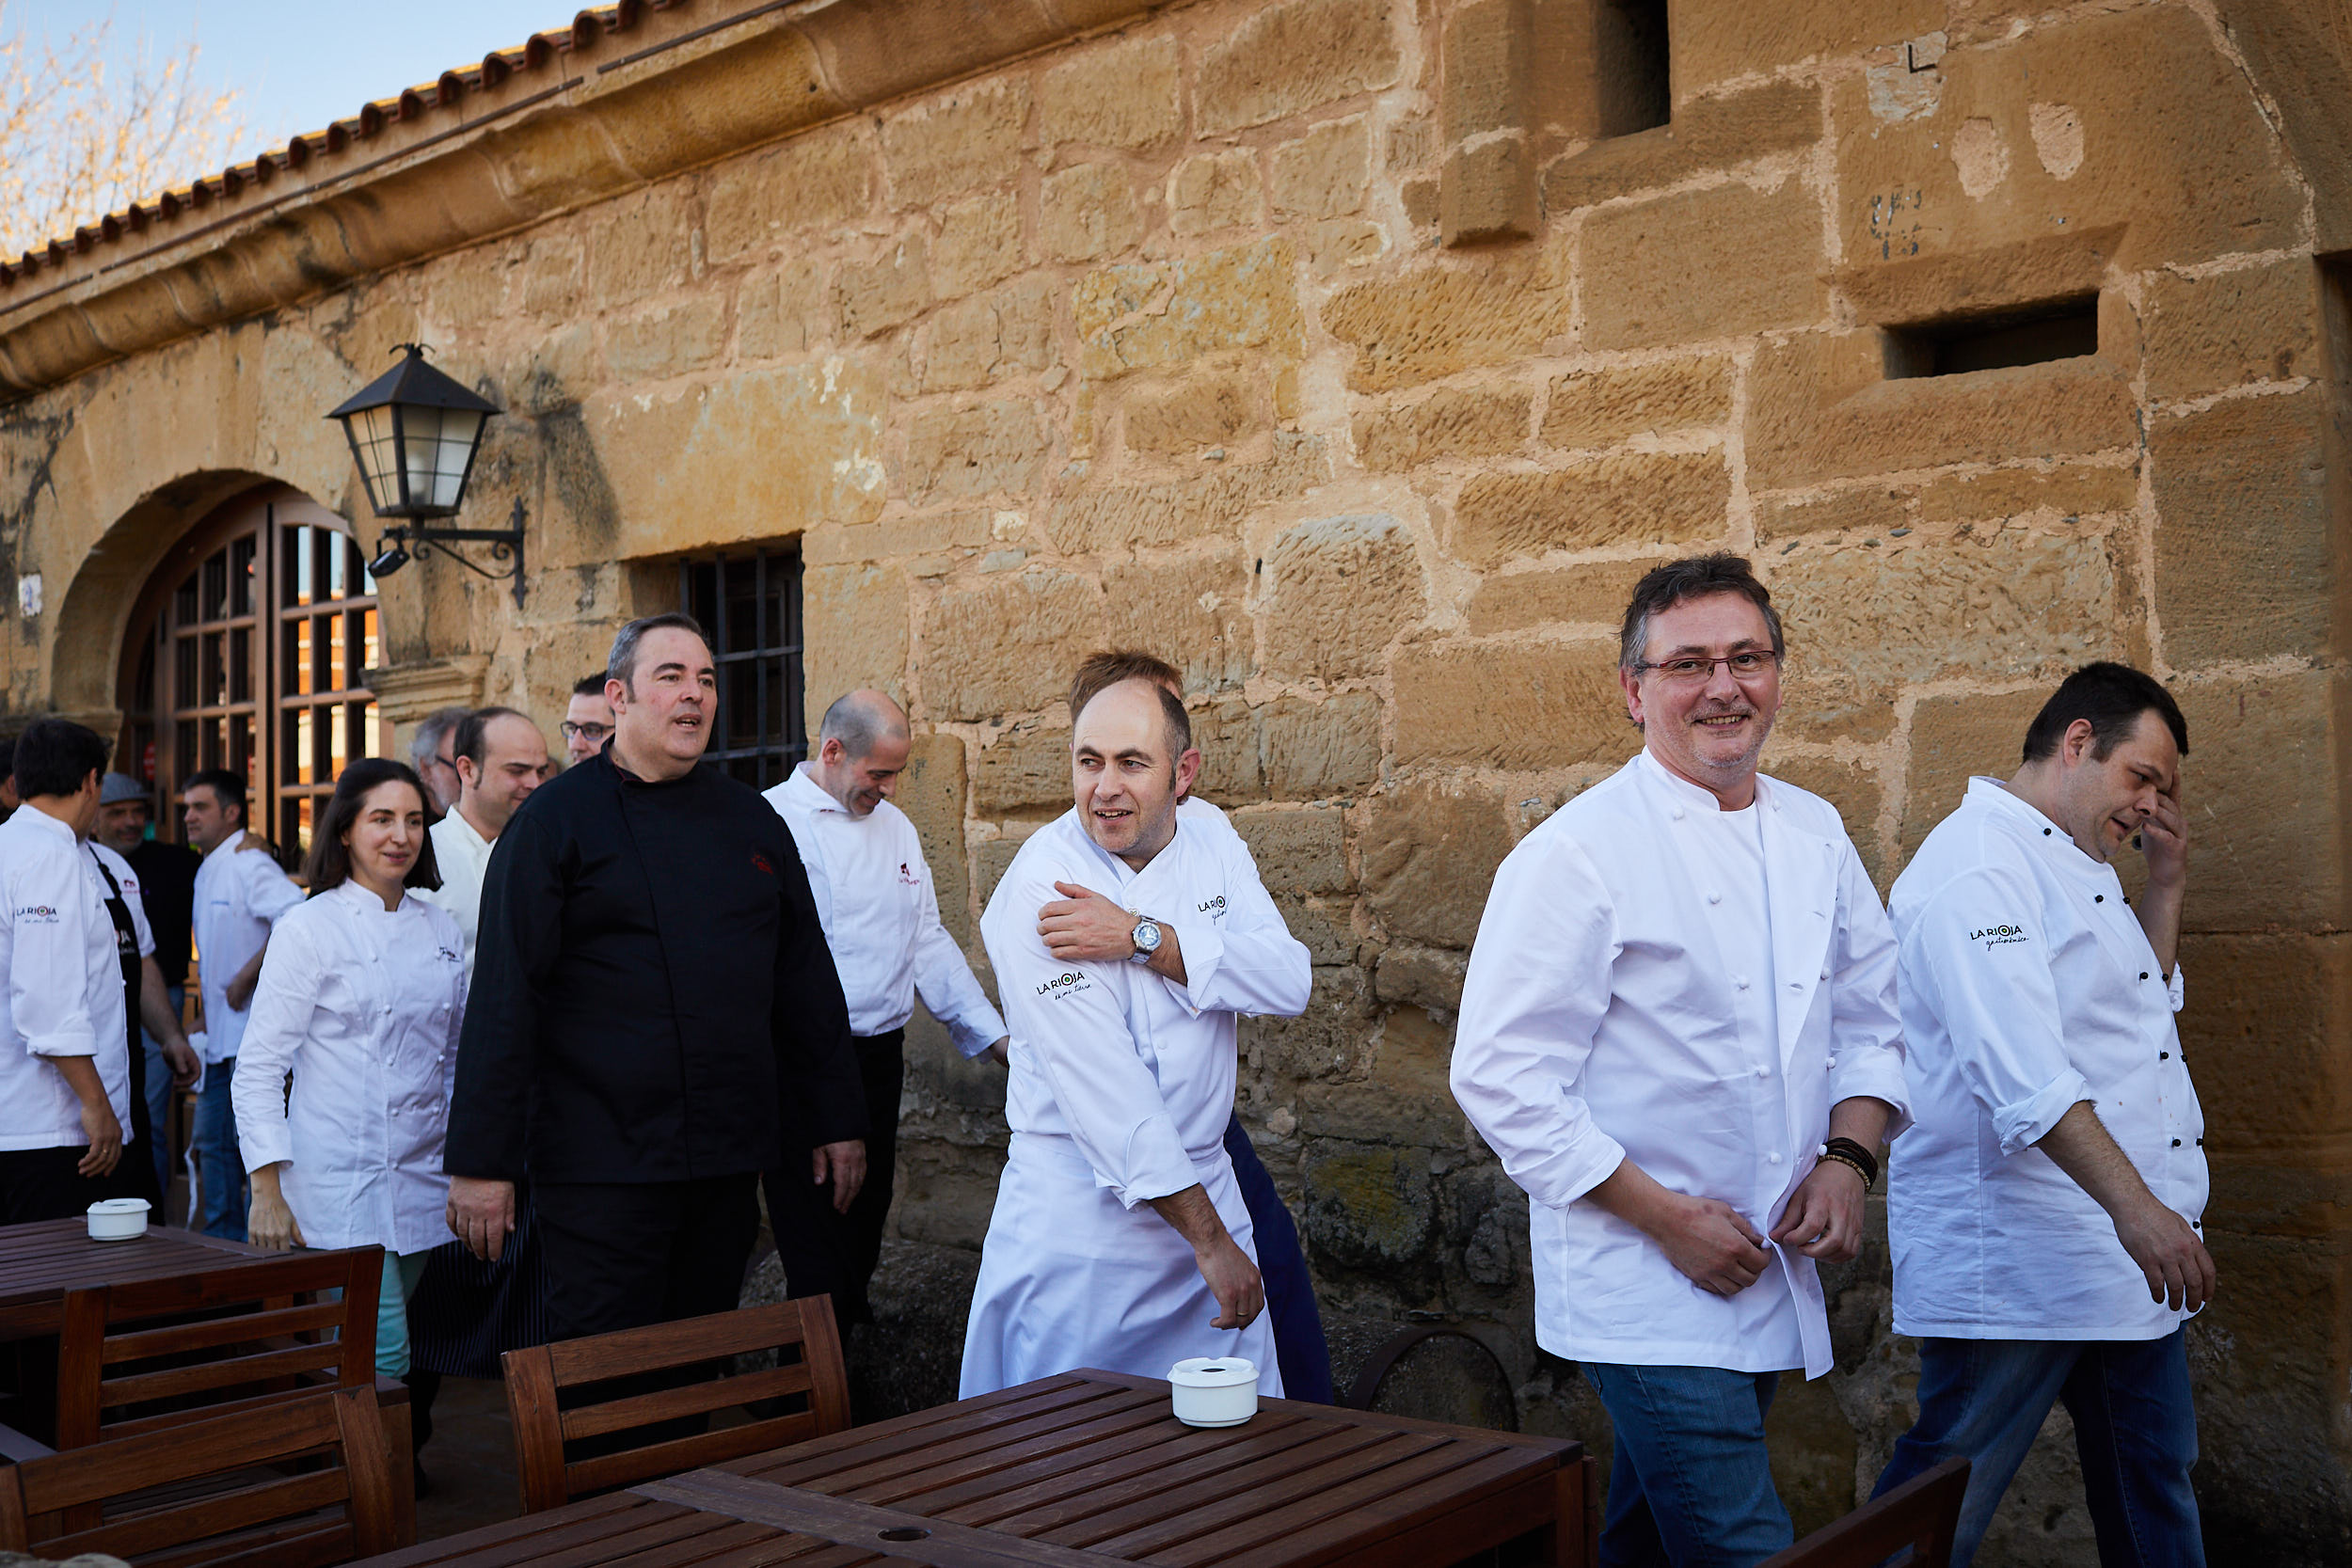 1903Restaurante_La_Vieja_Bodega_Casalarreina_La_Rioja_Spain_Sturcke_0016.jpg